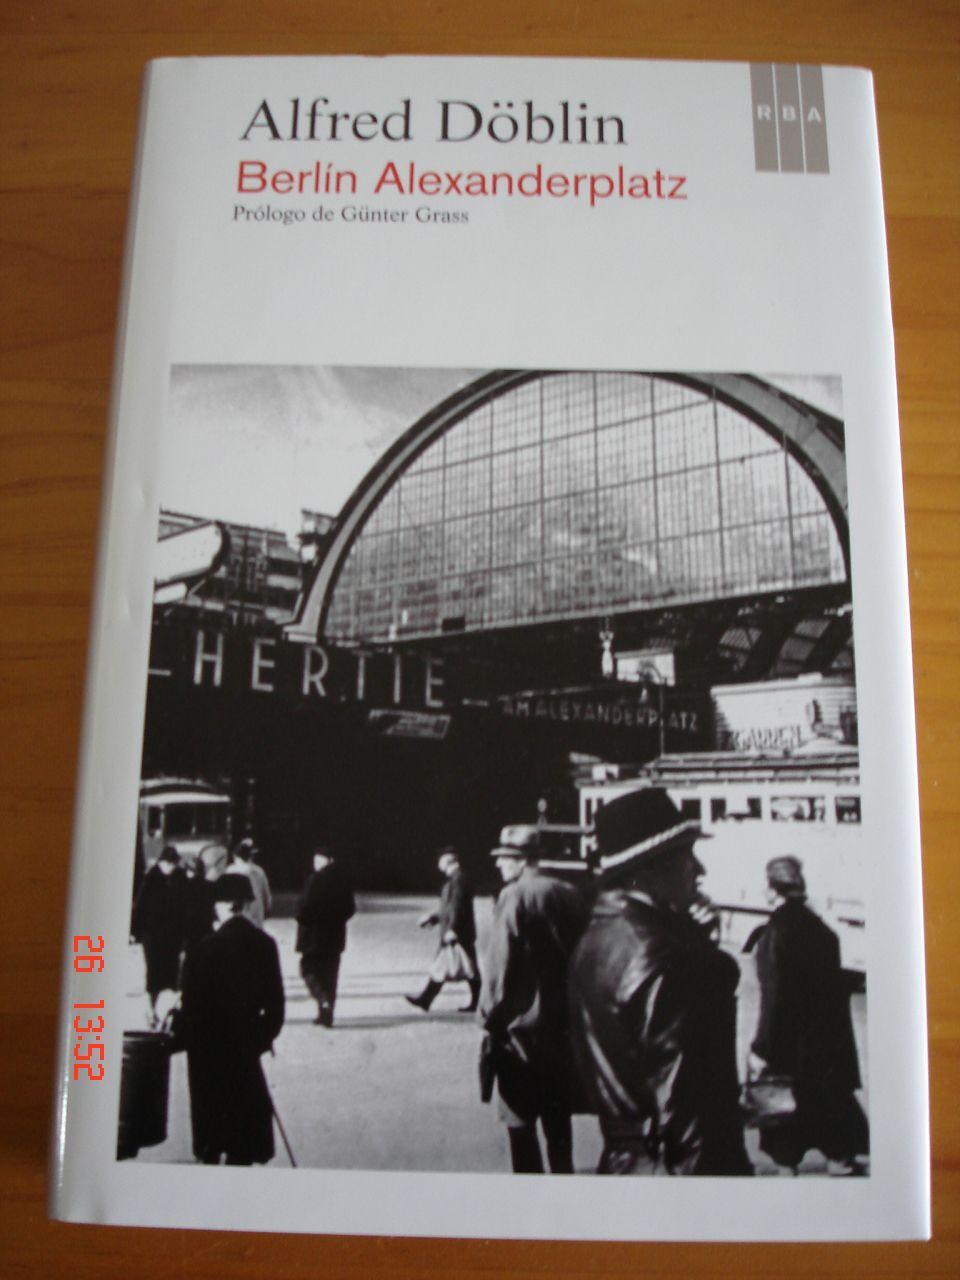 Berlin Alexanderplatz La Historia De Franz Biberkopf De Alfred Doblin Excelente Estado 2014 Libreria Mareiro